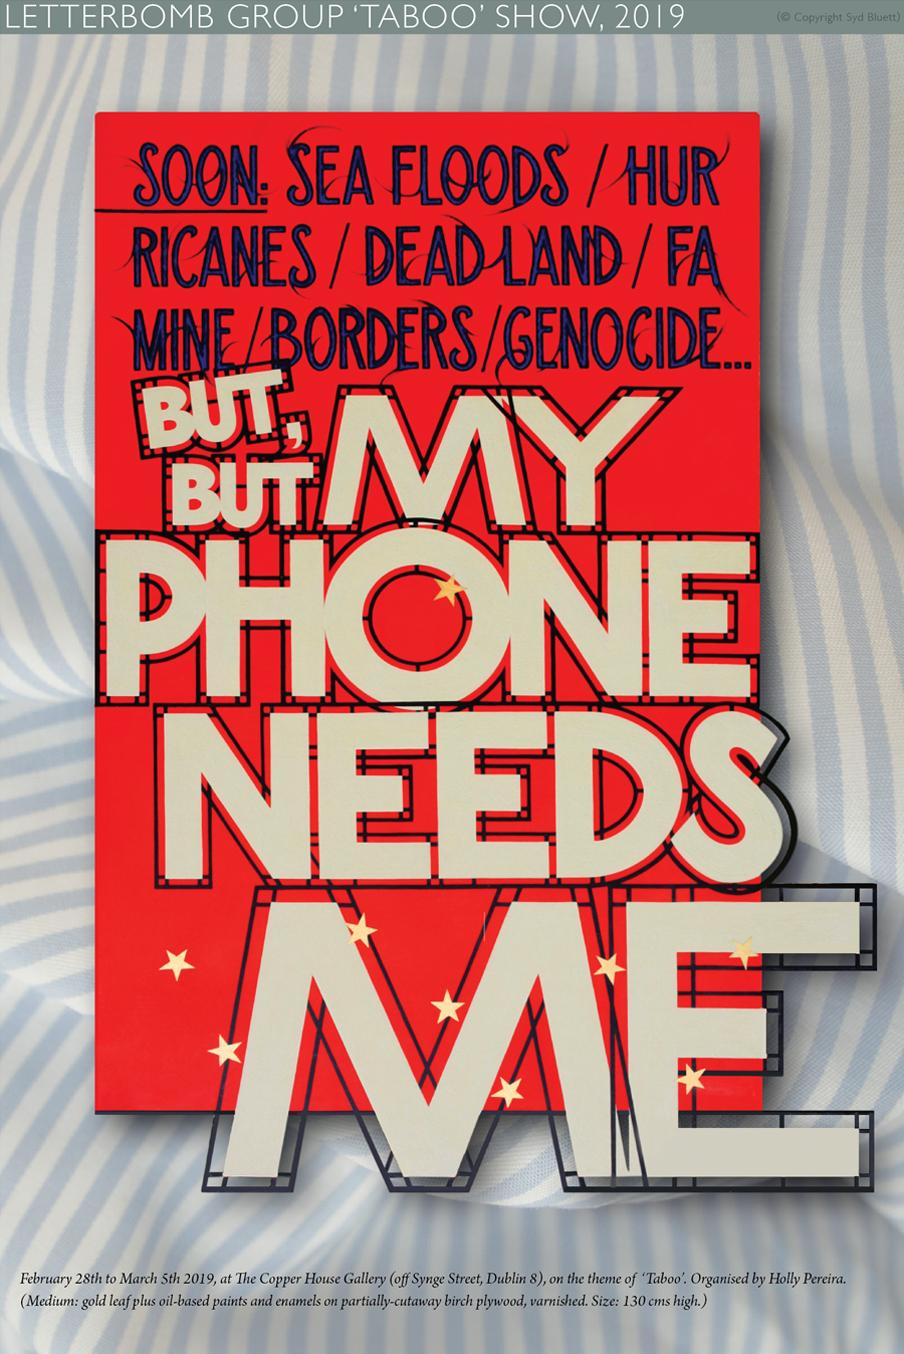 My phone needs me